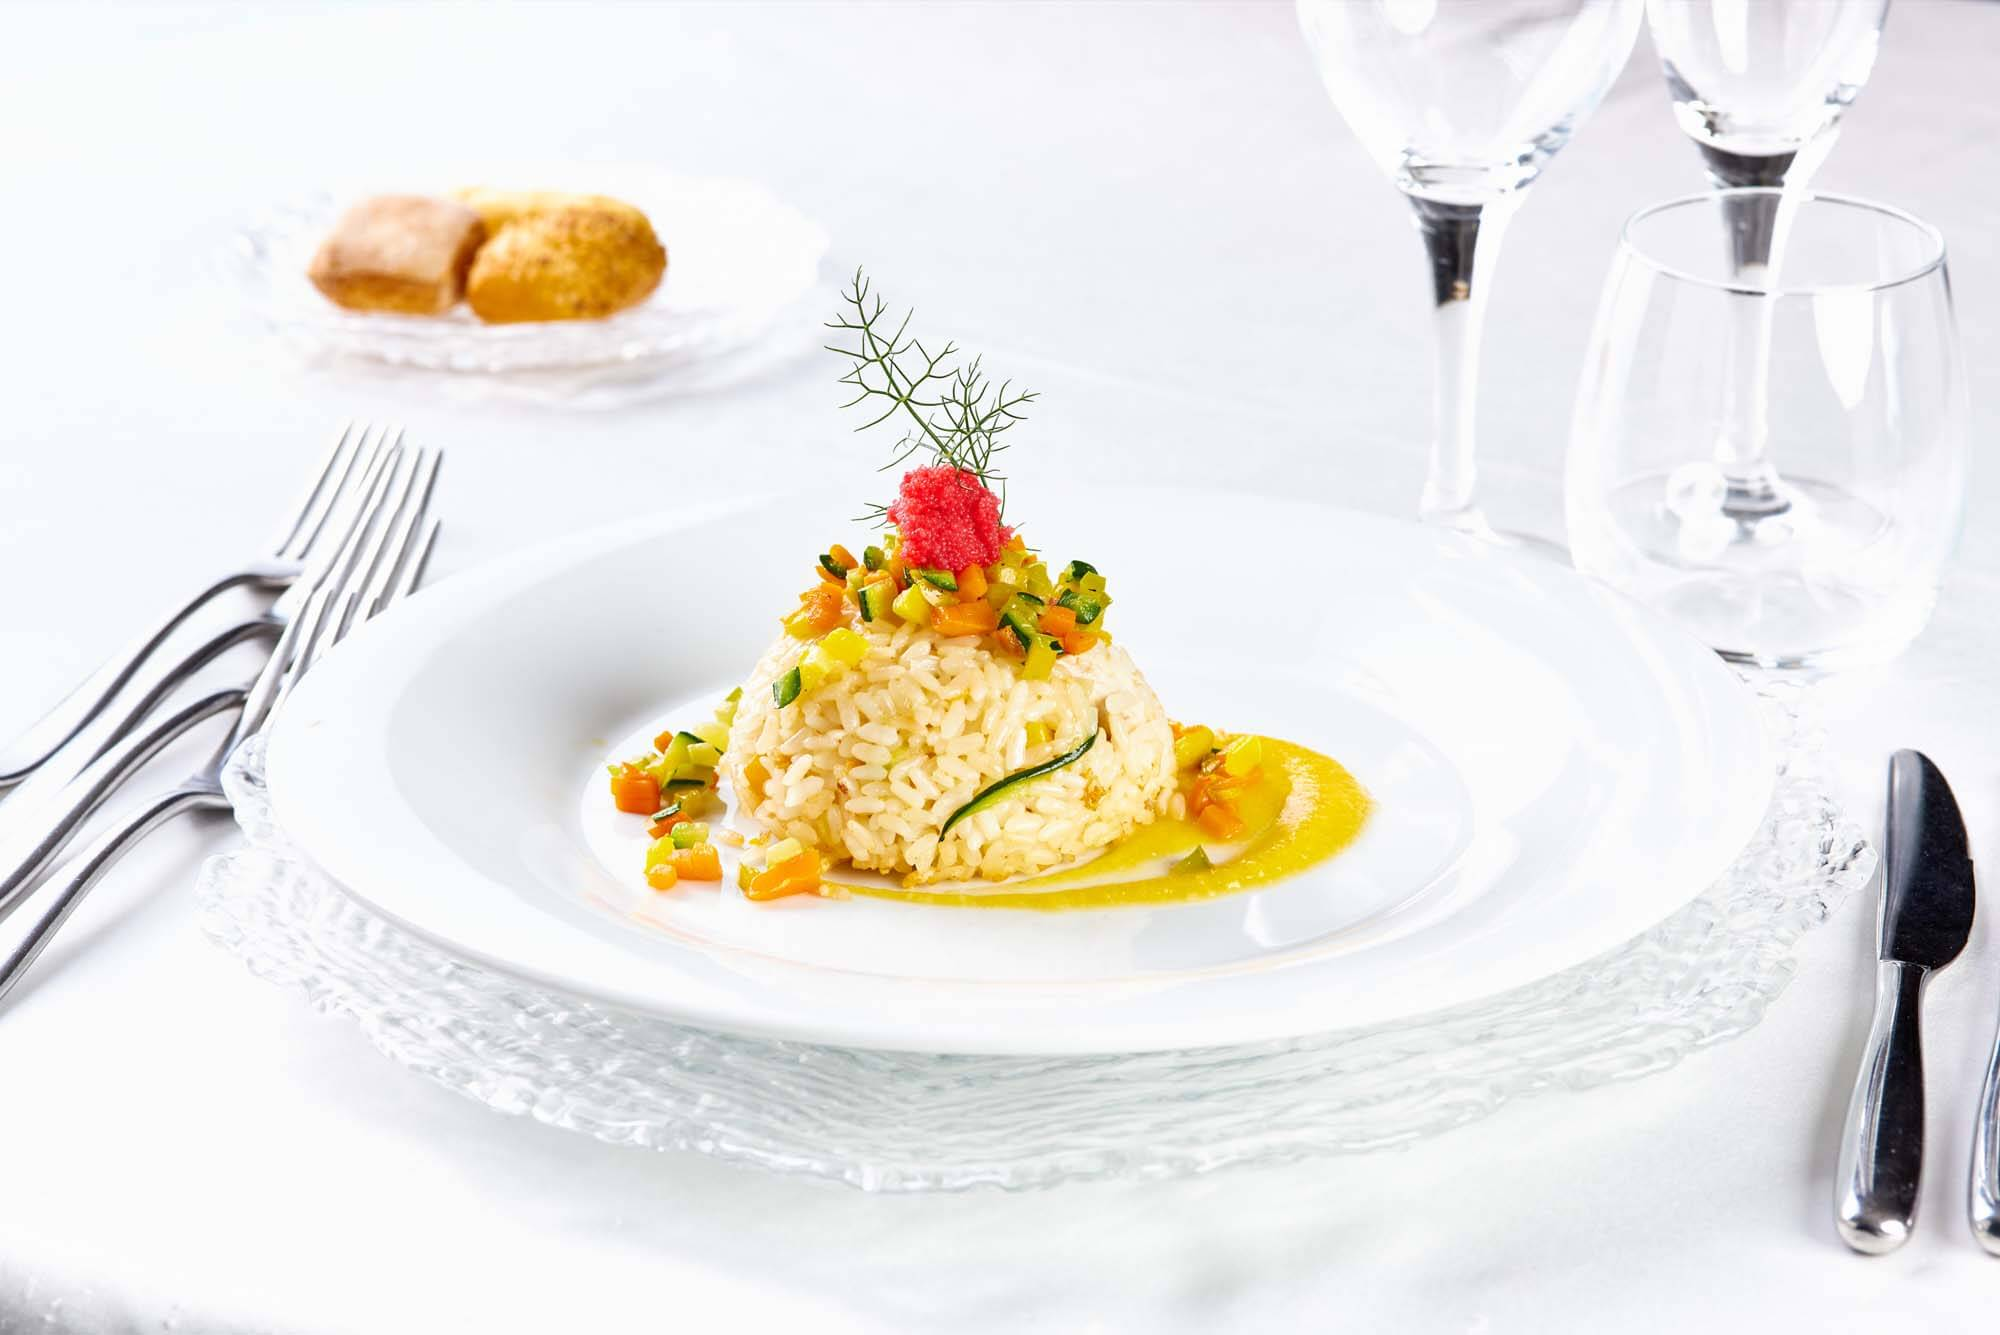 bbadv-photoshooting-food-villa-fabiana-14